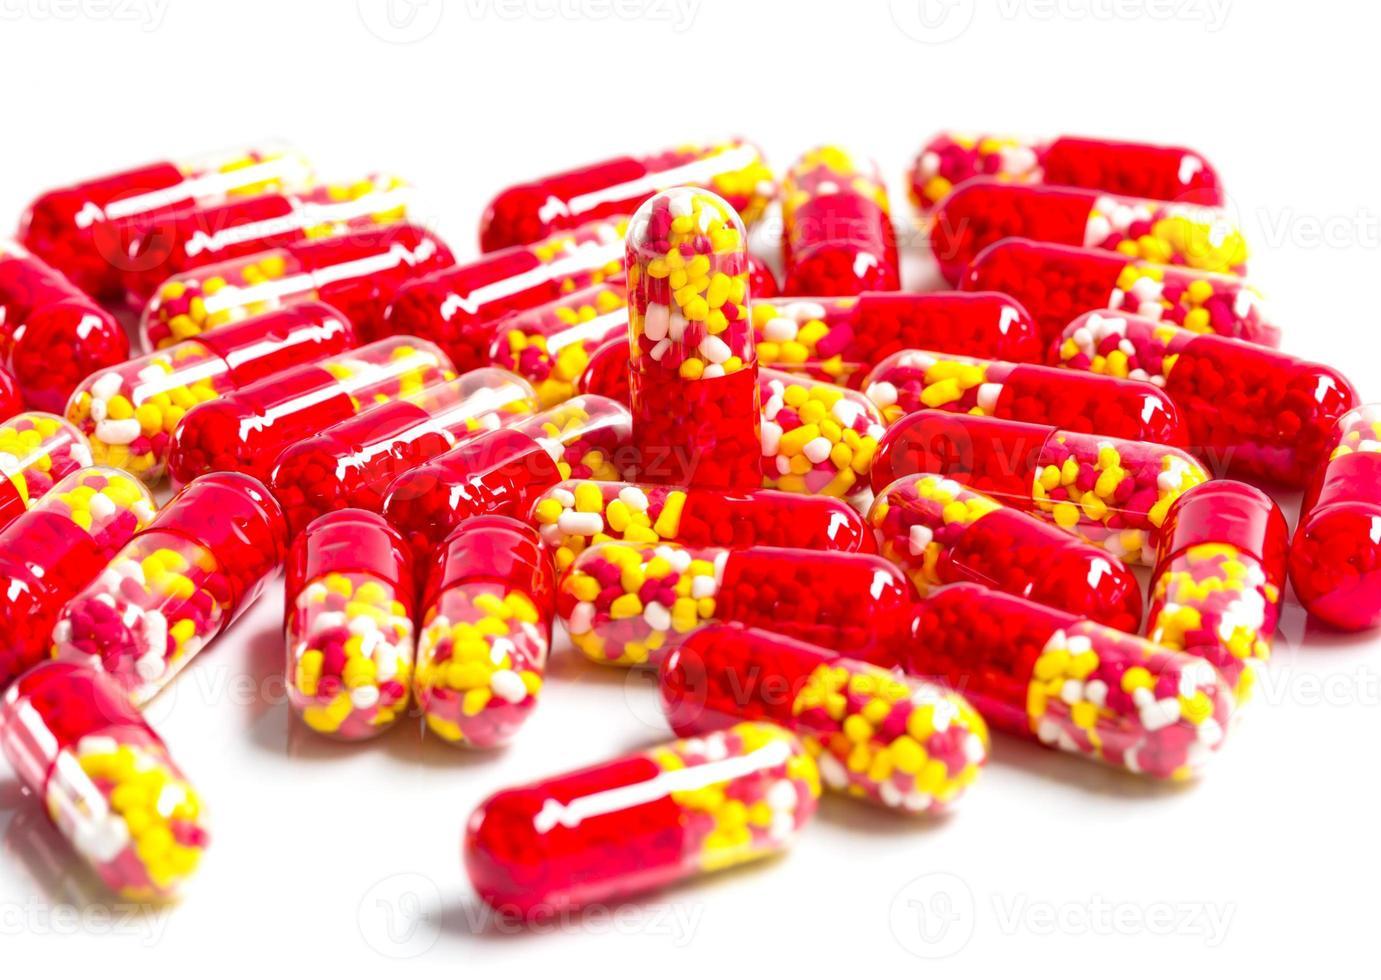 cápsula de medicamento. foto